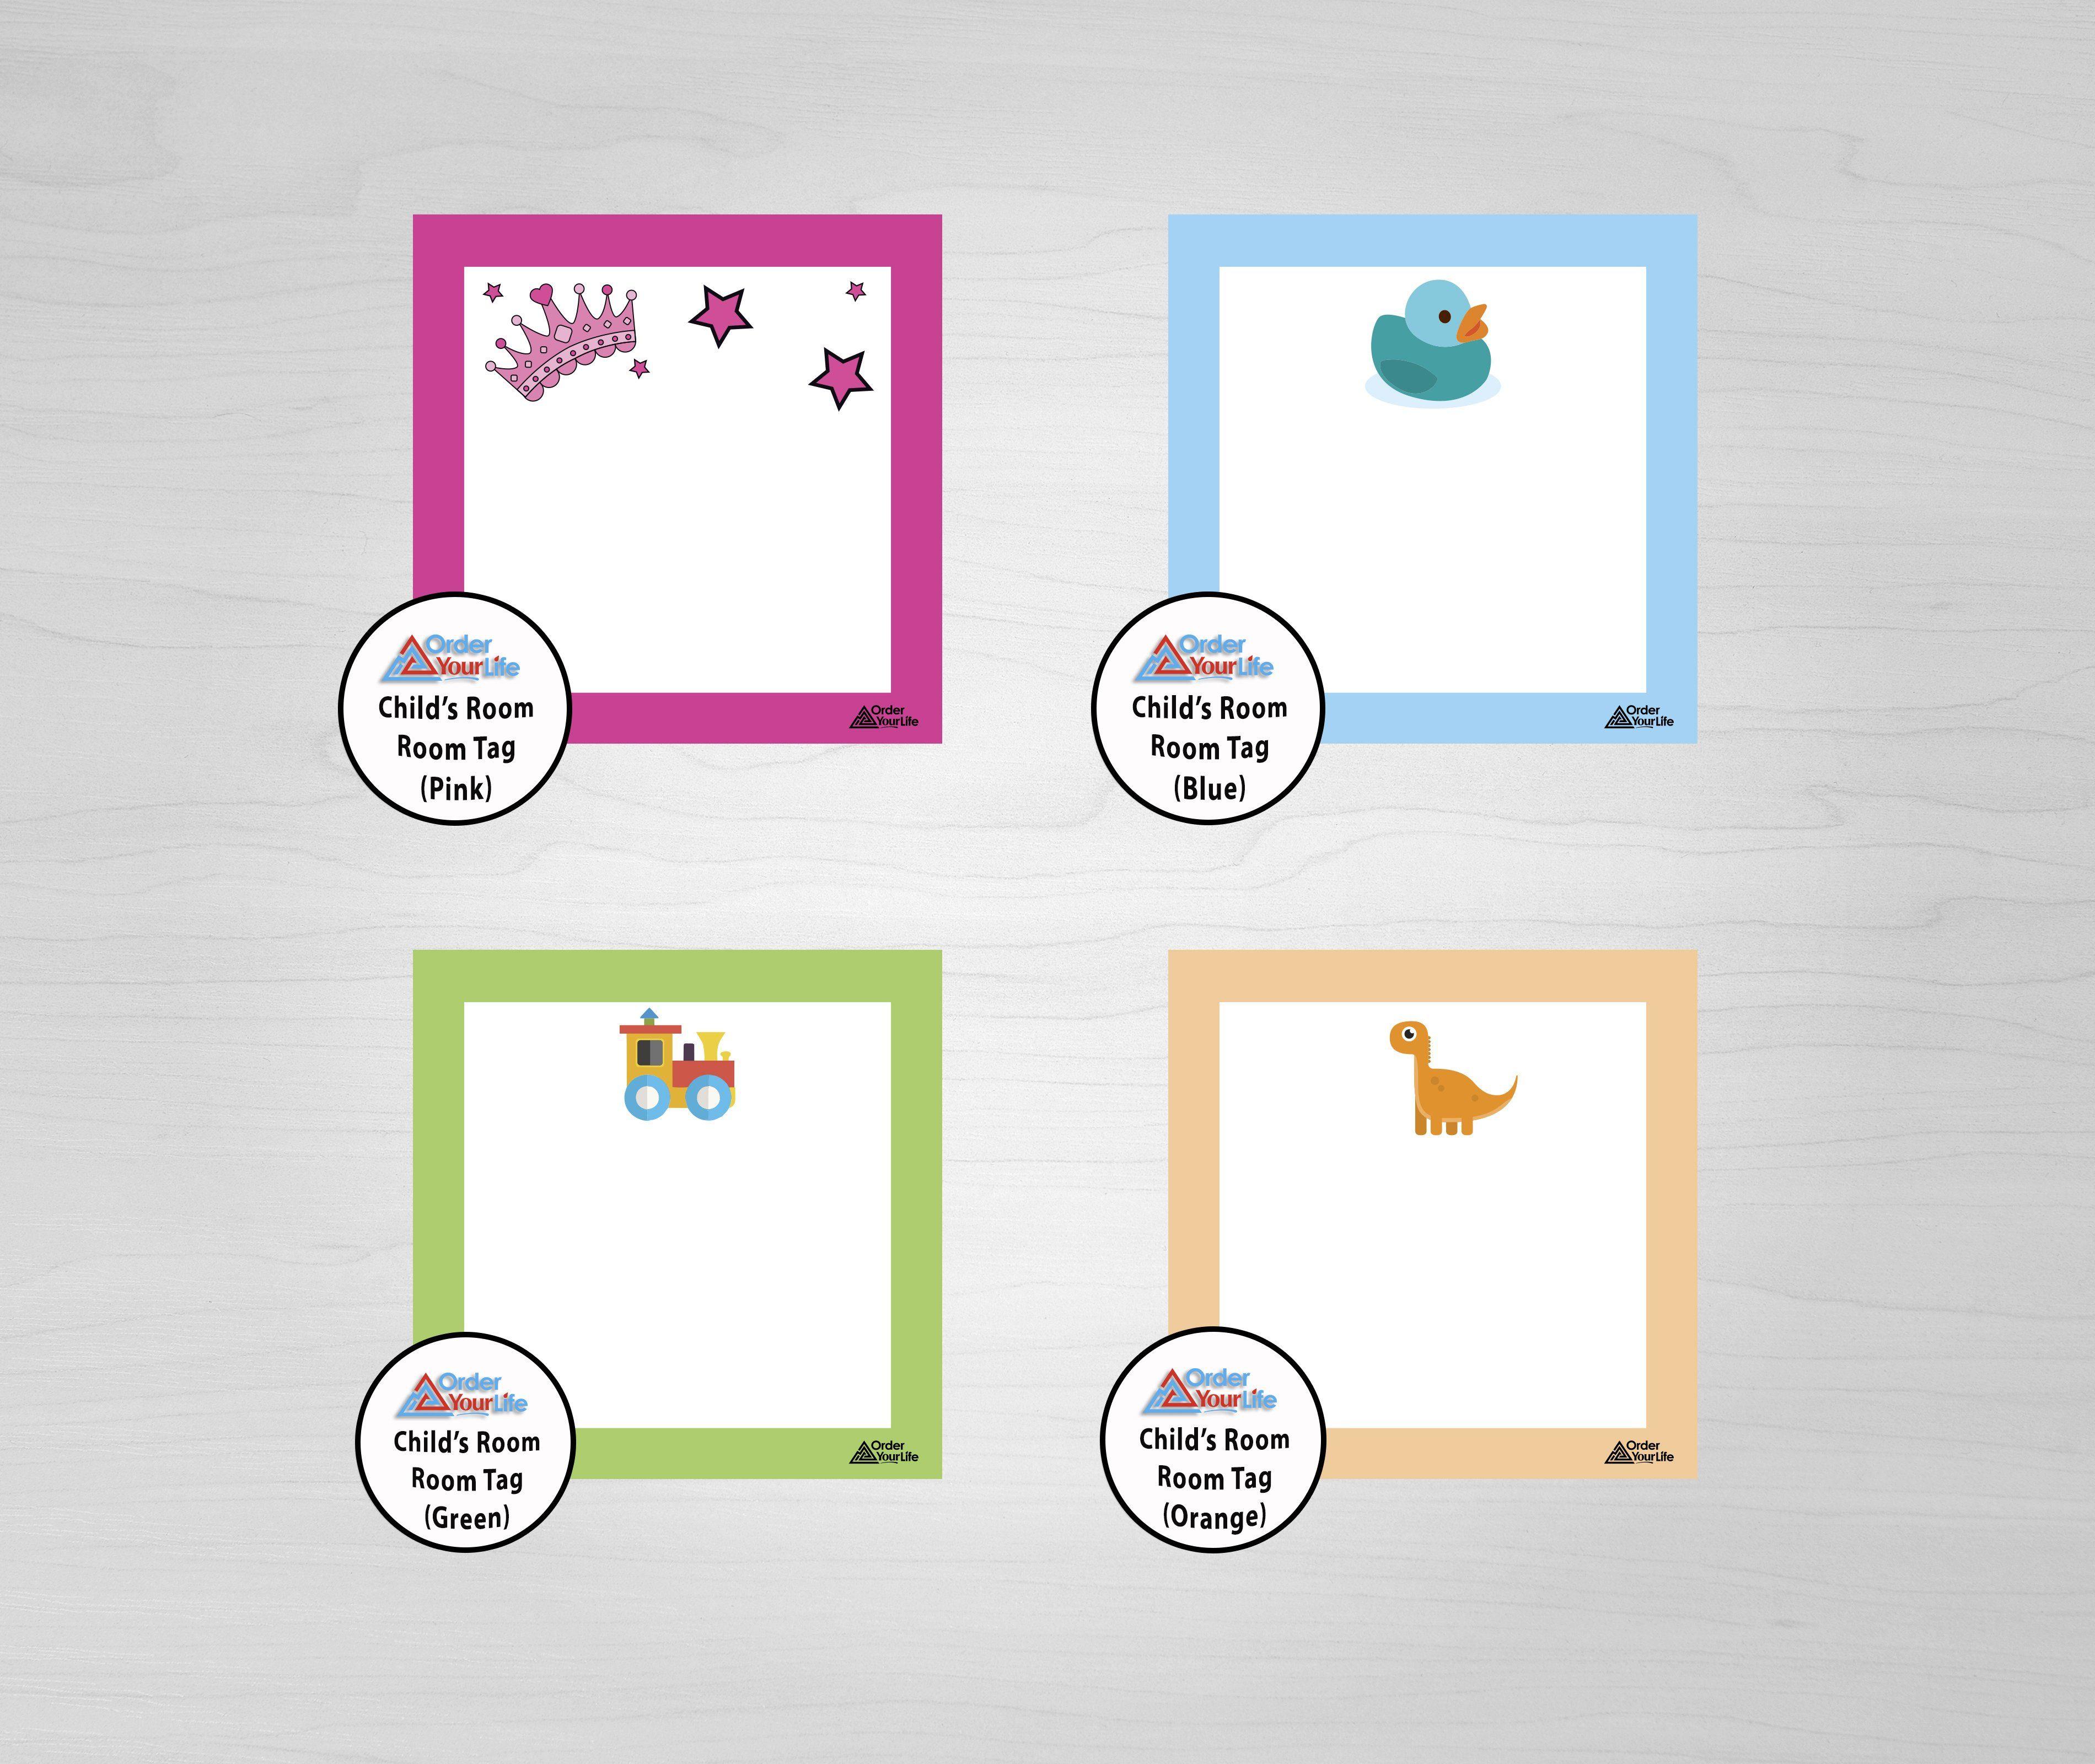 Room Tags - Print & Ship / Child's Room Room Tag (Pink)